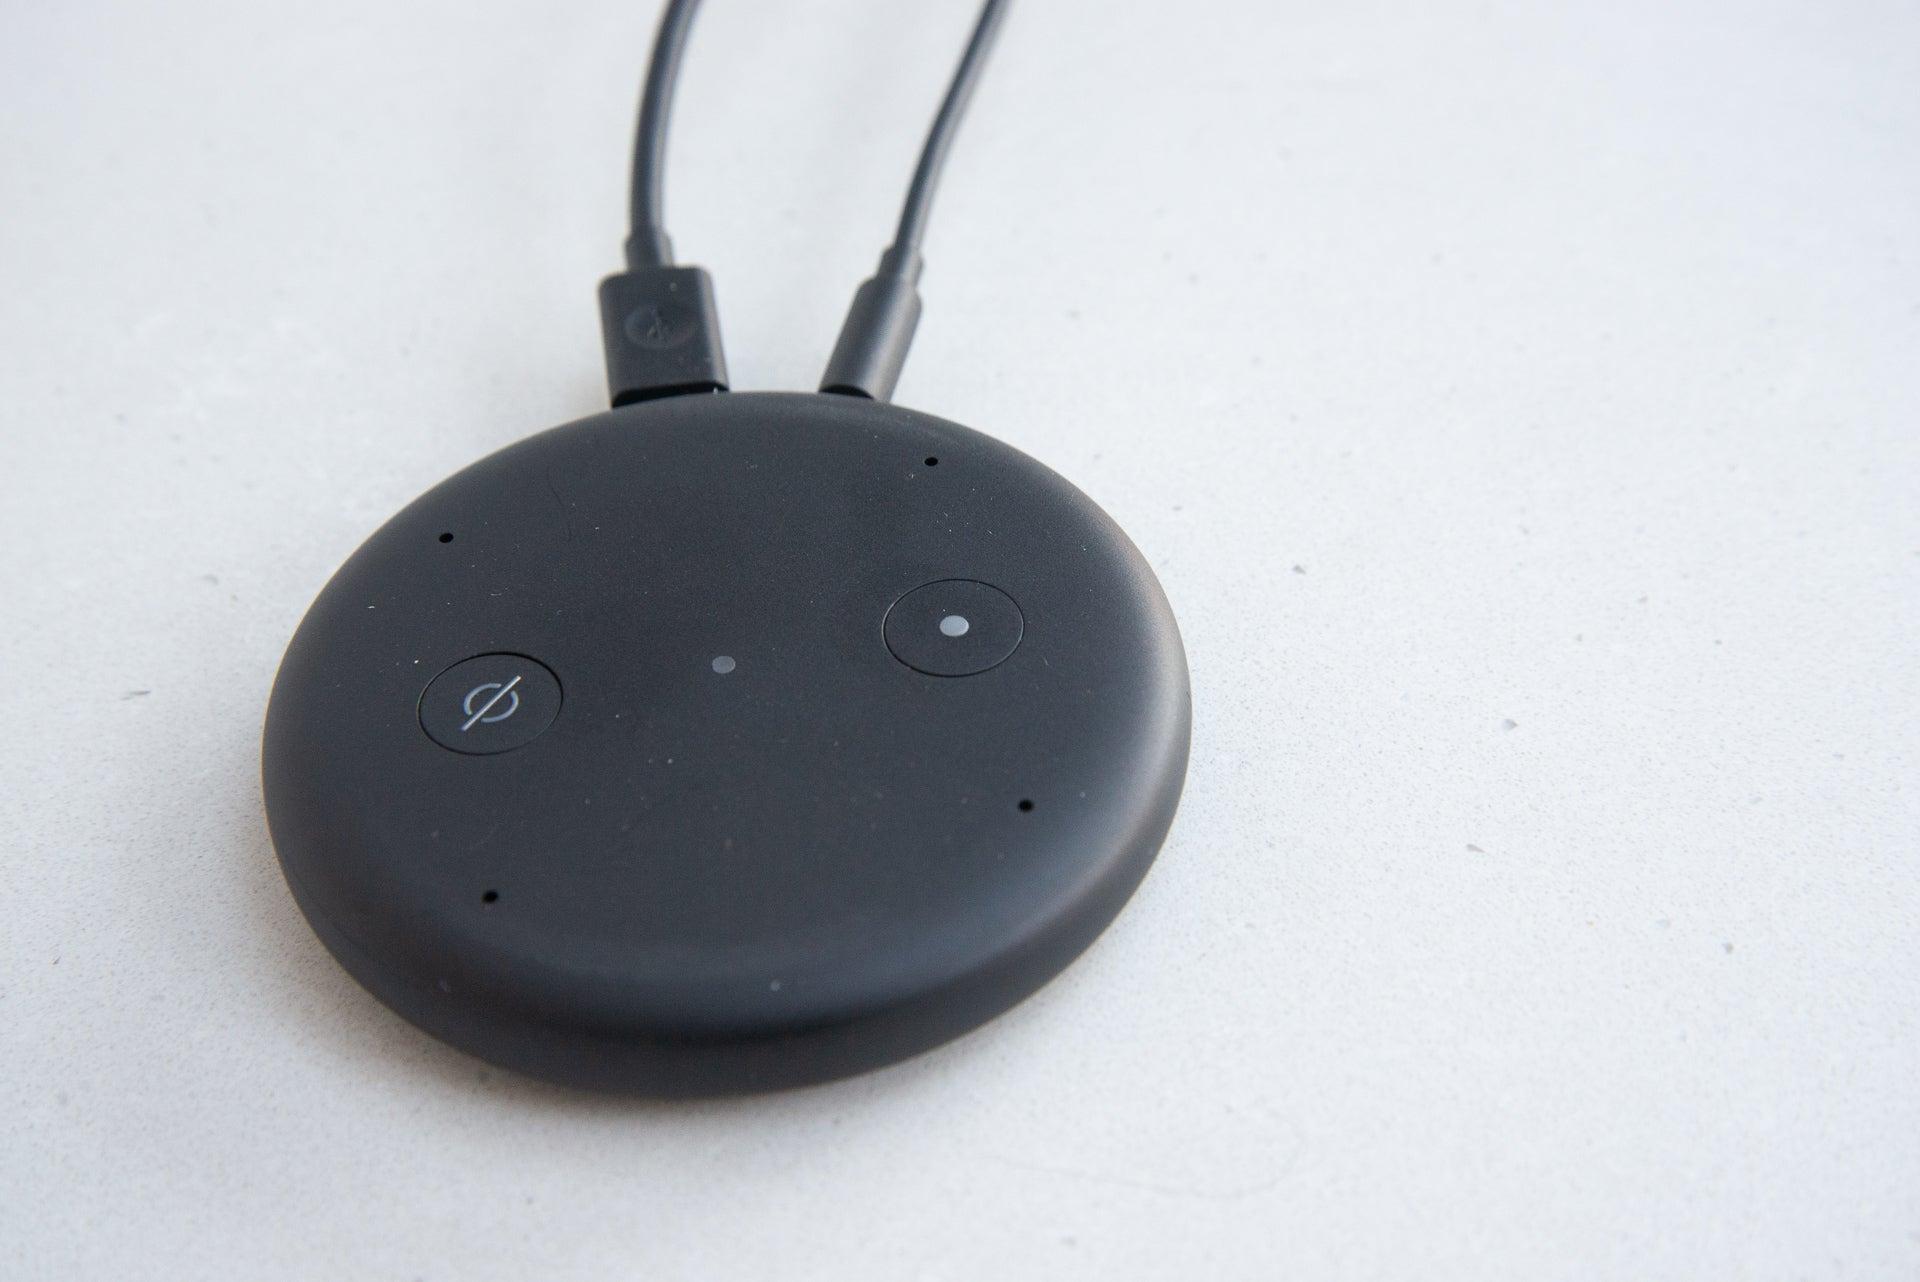 Amazon Echo Input controls